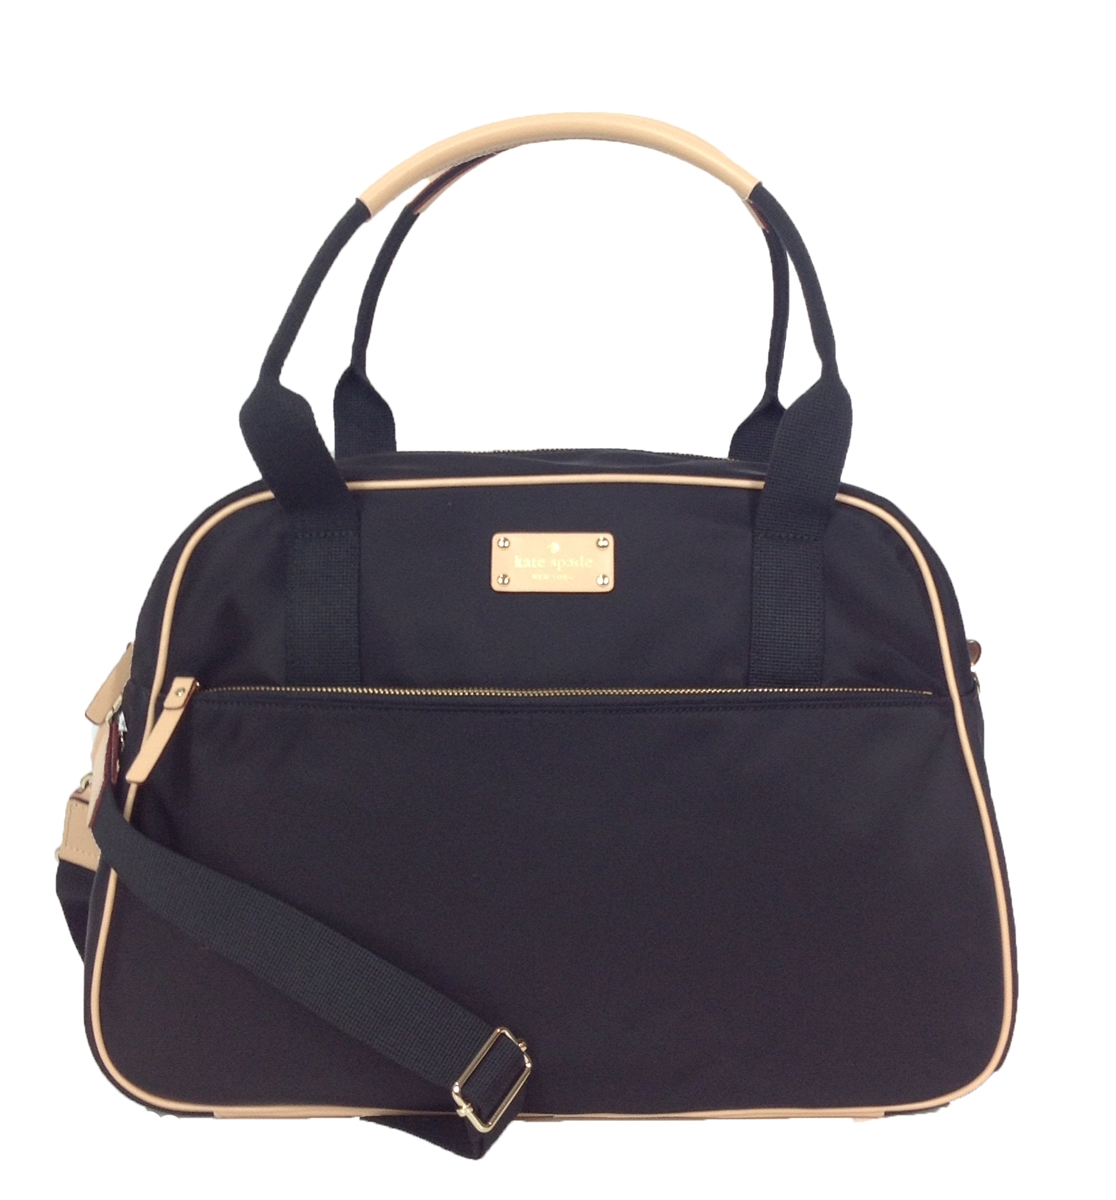 Kate Spade Kennedy Park Nylon Milla Travel Bag Black